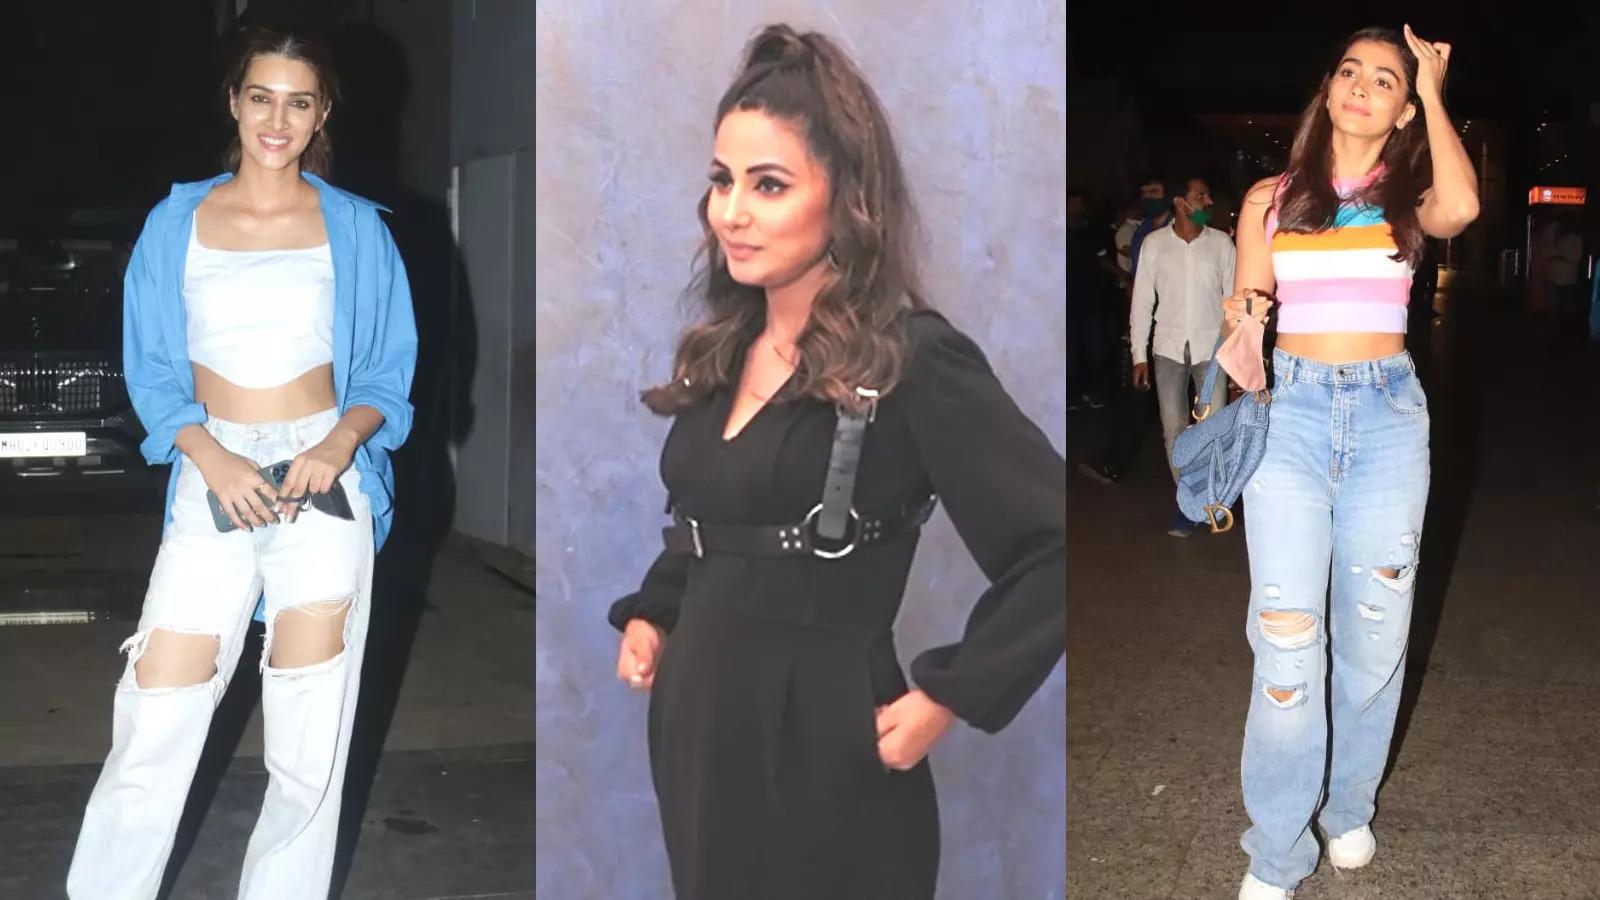 celebritiyevenings-from-kriti-sanon-to-pooja-hegde-bollywood-celebs-spotted-in-mumbai